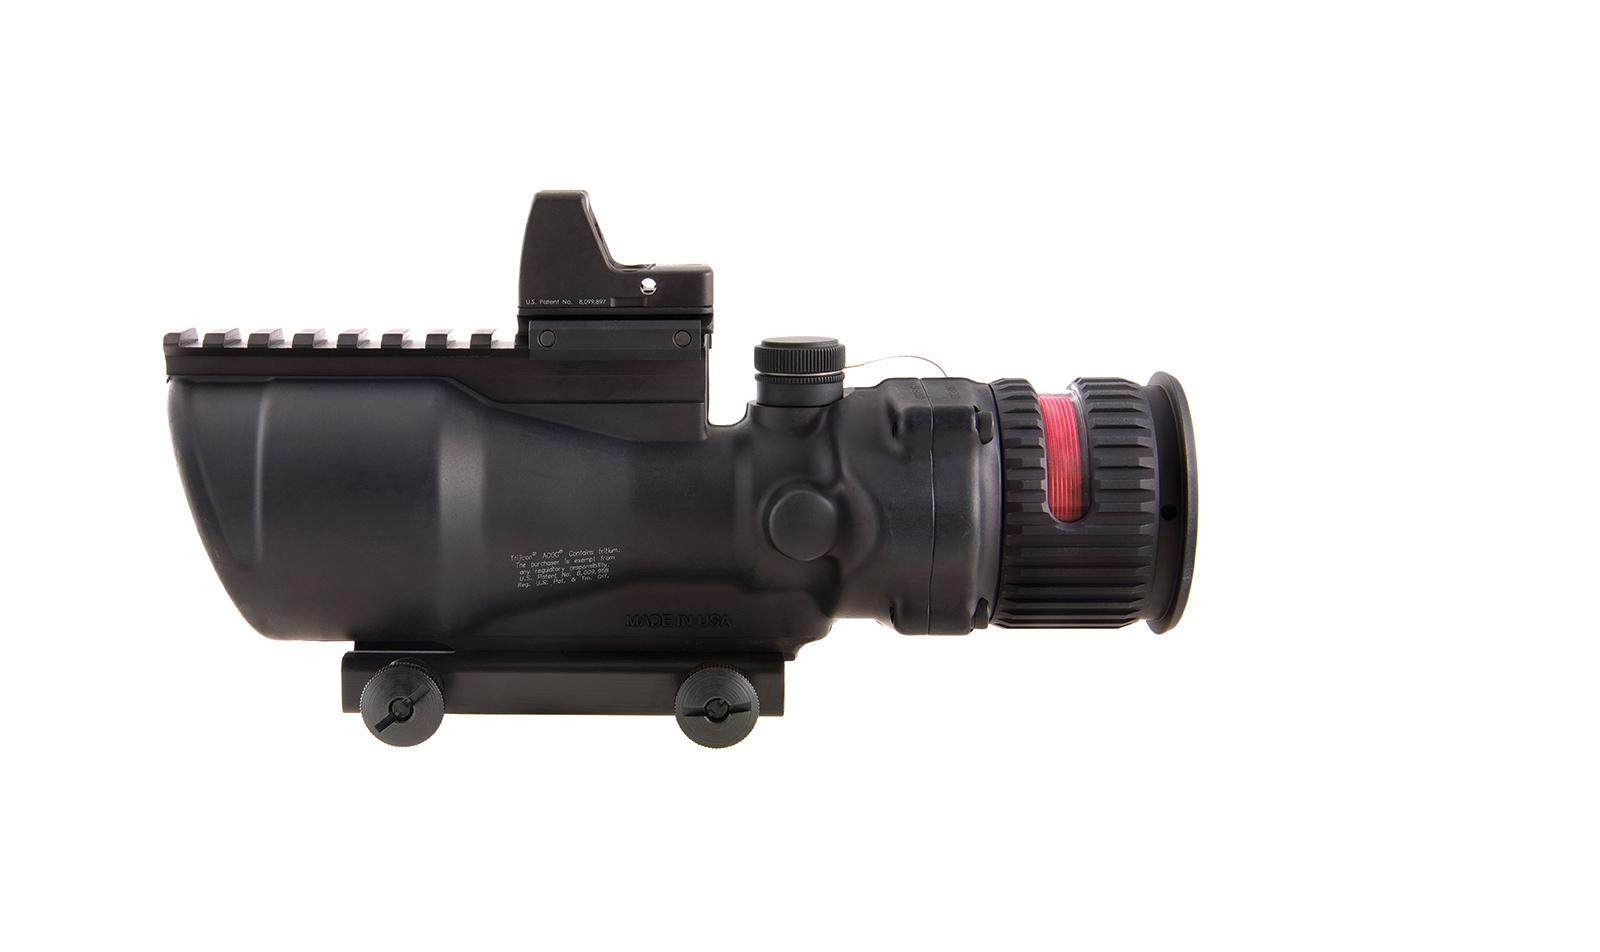 TA648-D-100560 angle 2